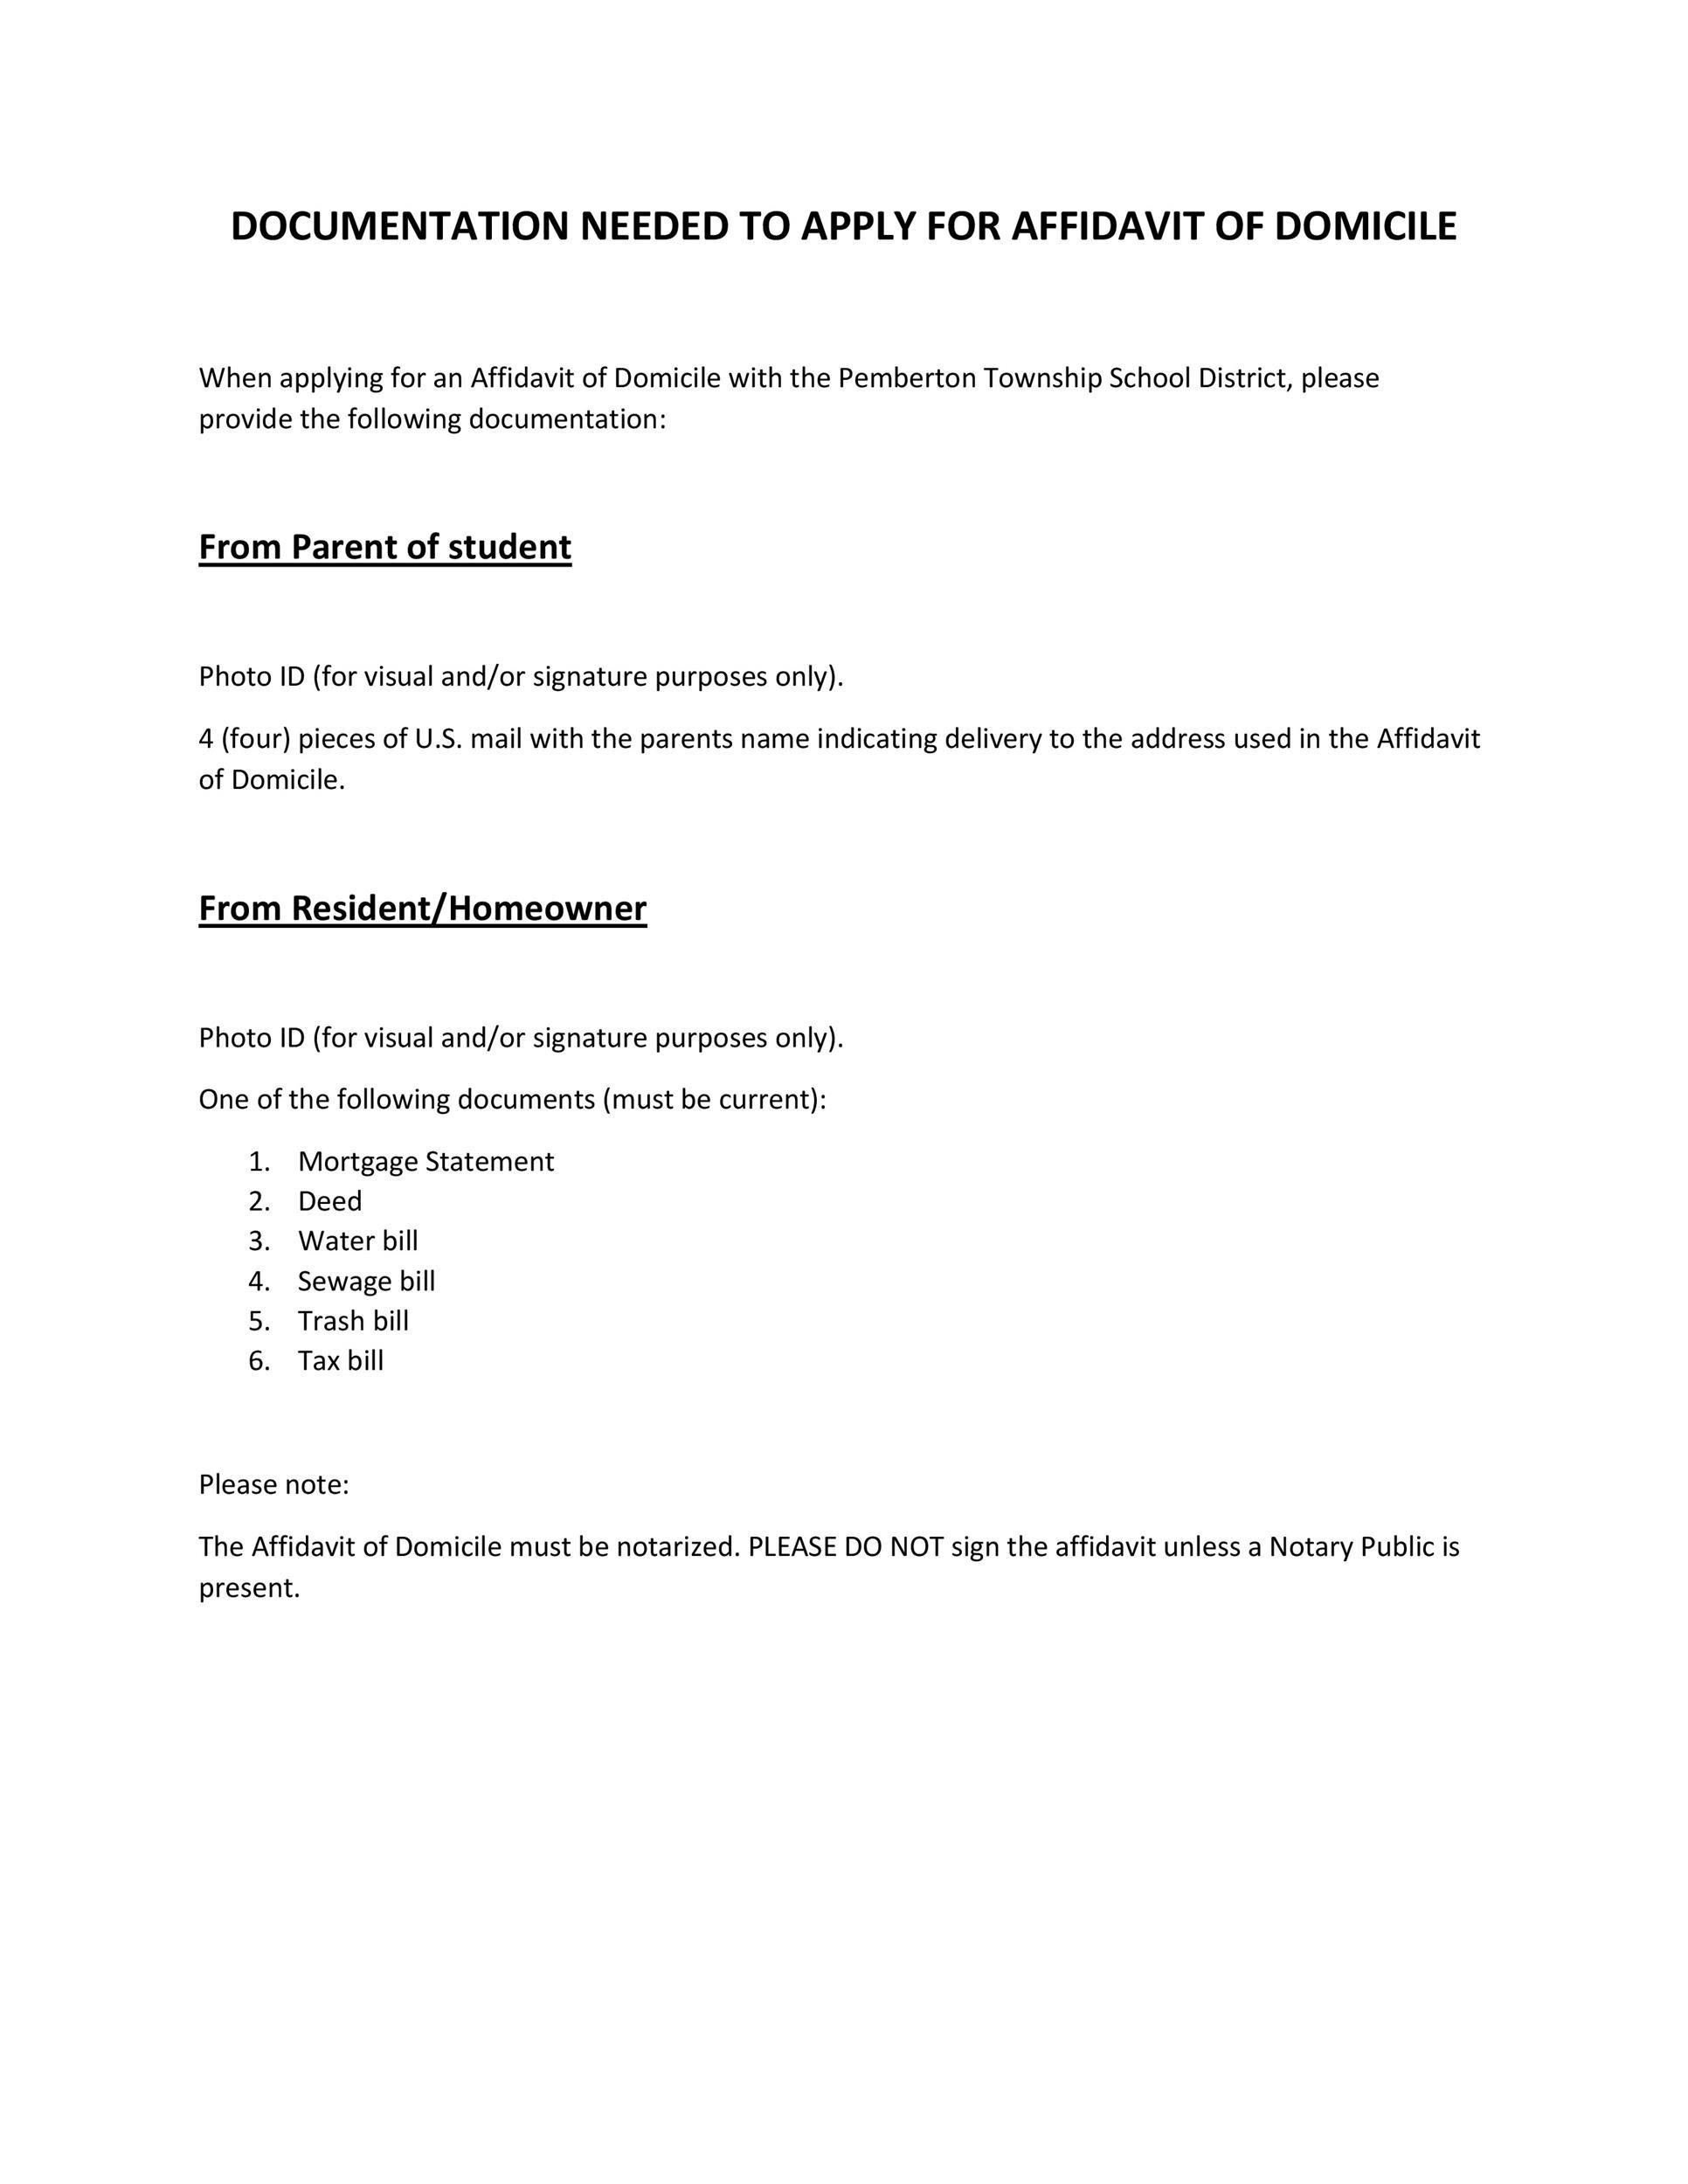 Free affidavit of domicile 20